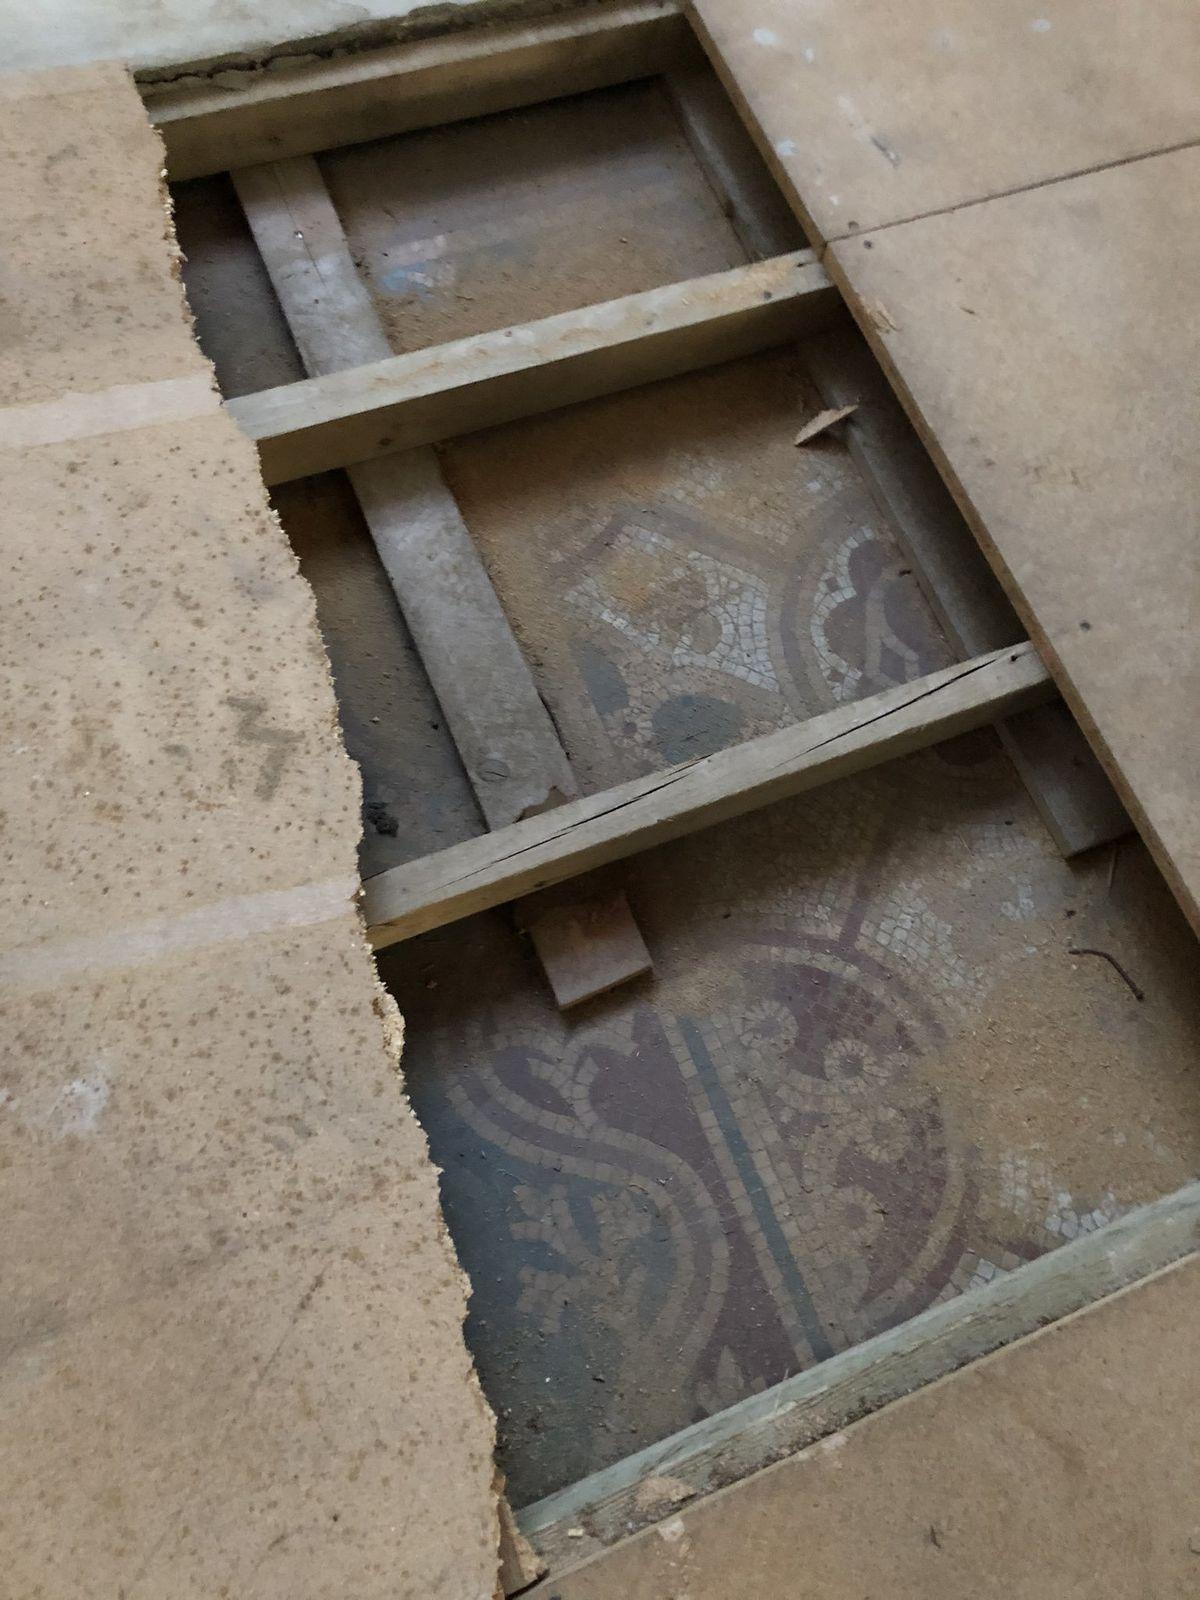 The Pugin flooring was uncovered at Shrewsbury Cathedral. Picture: Shrewsbury Cathedral